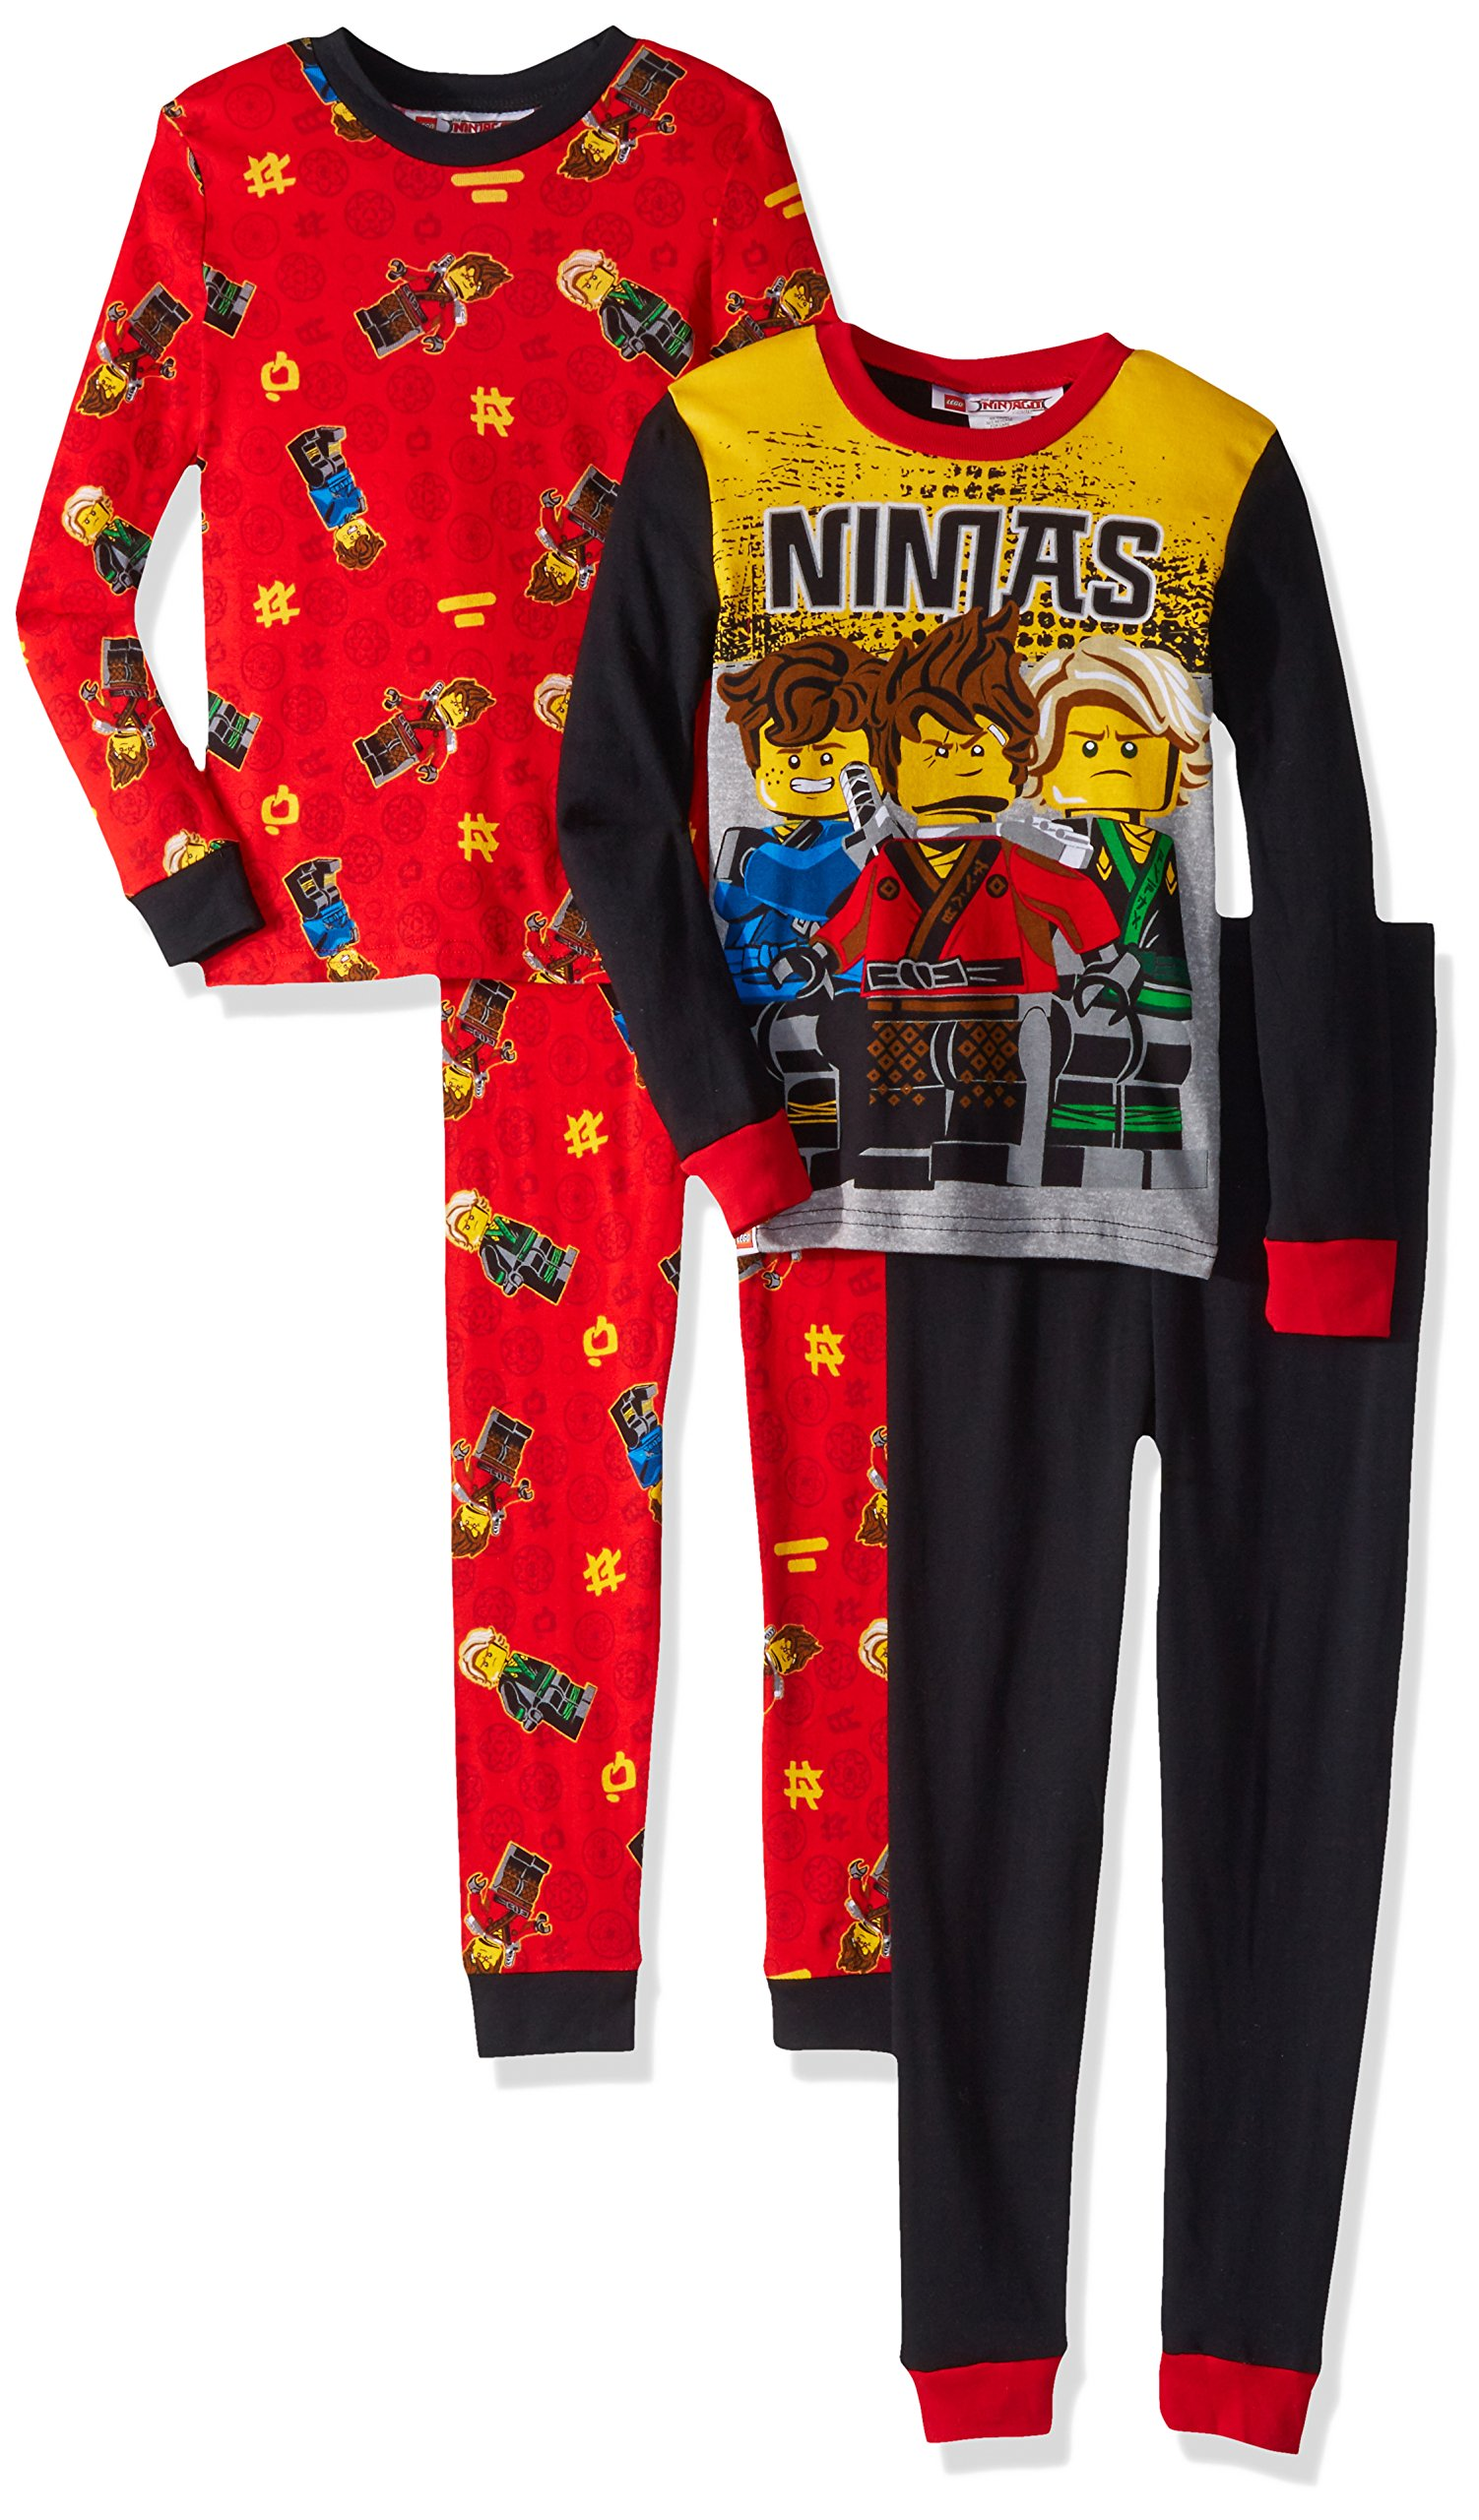 LEGO Big Boys' Ninjago 4-Pc Pajama, 2 Sets Sleeve, Long Pant, Black, 8